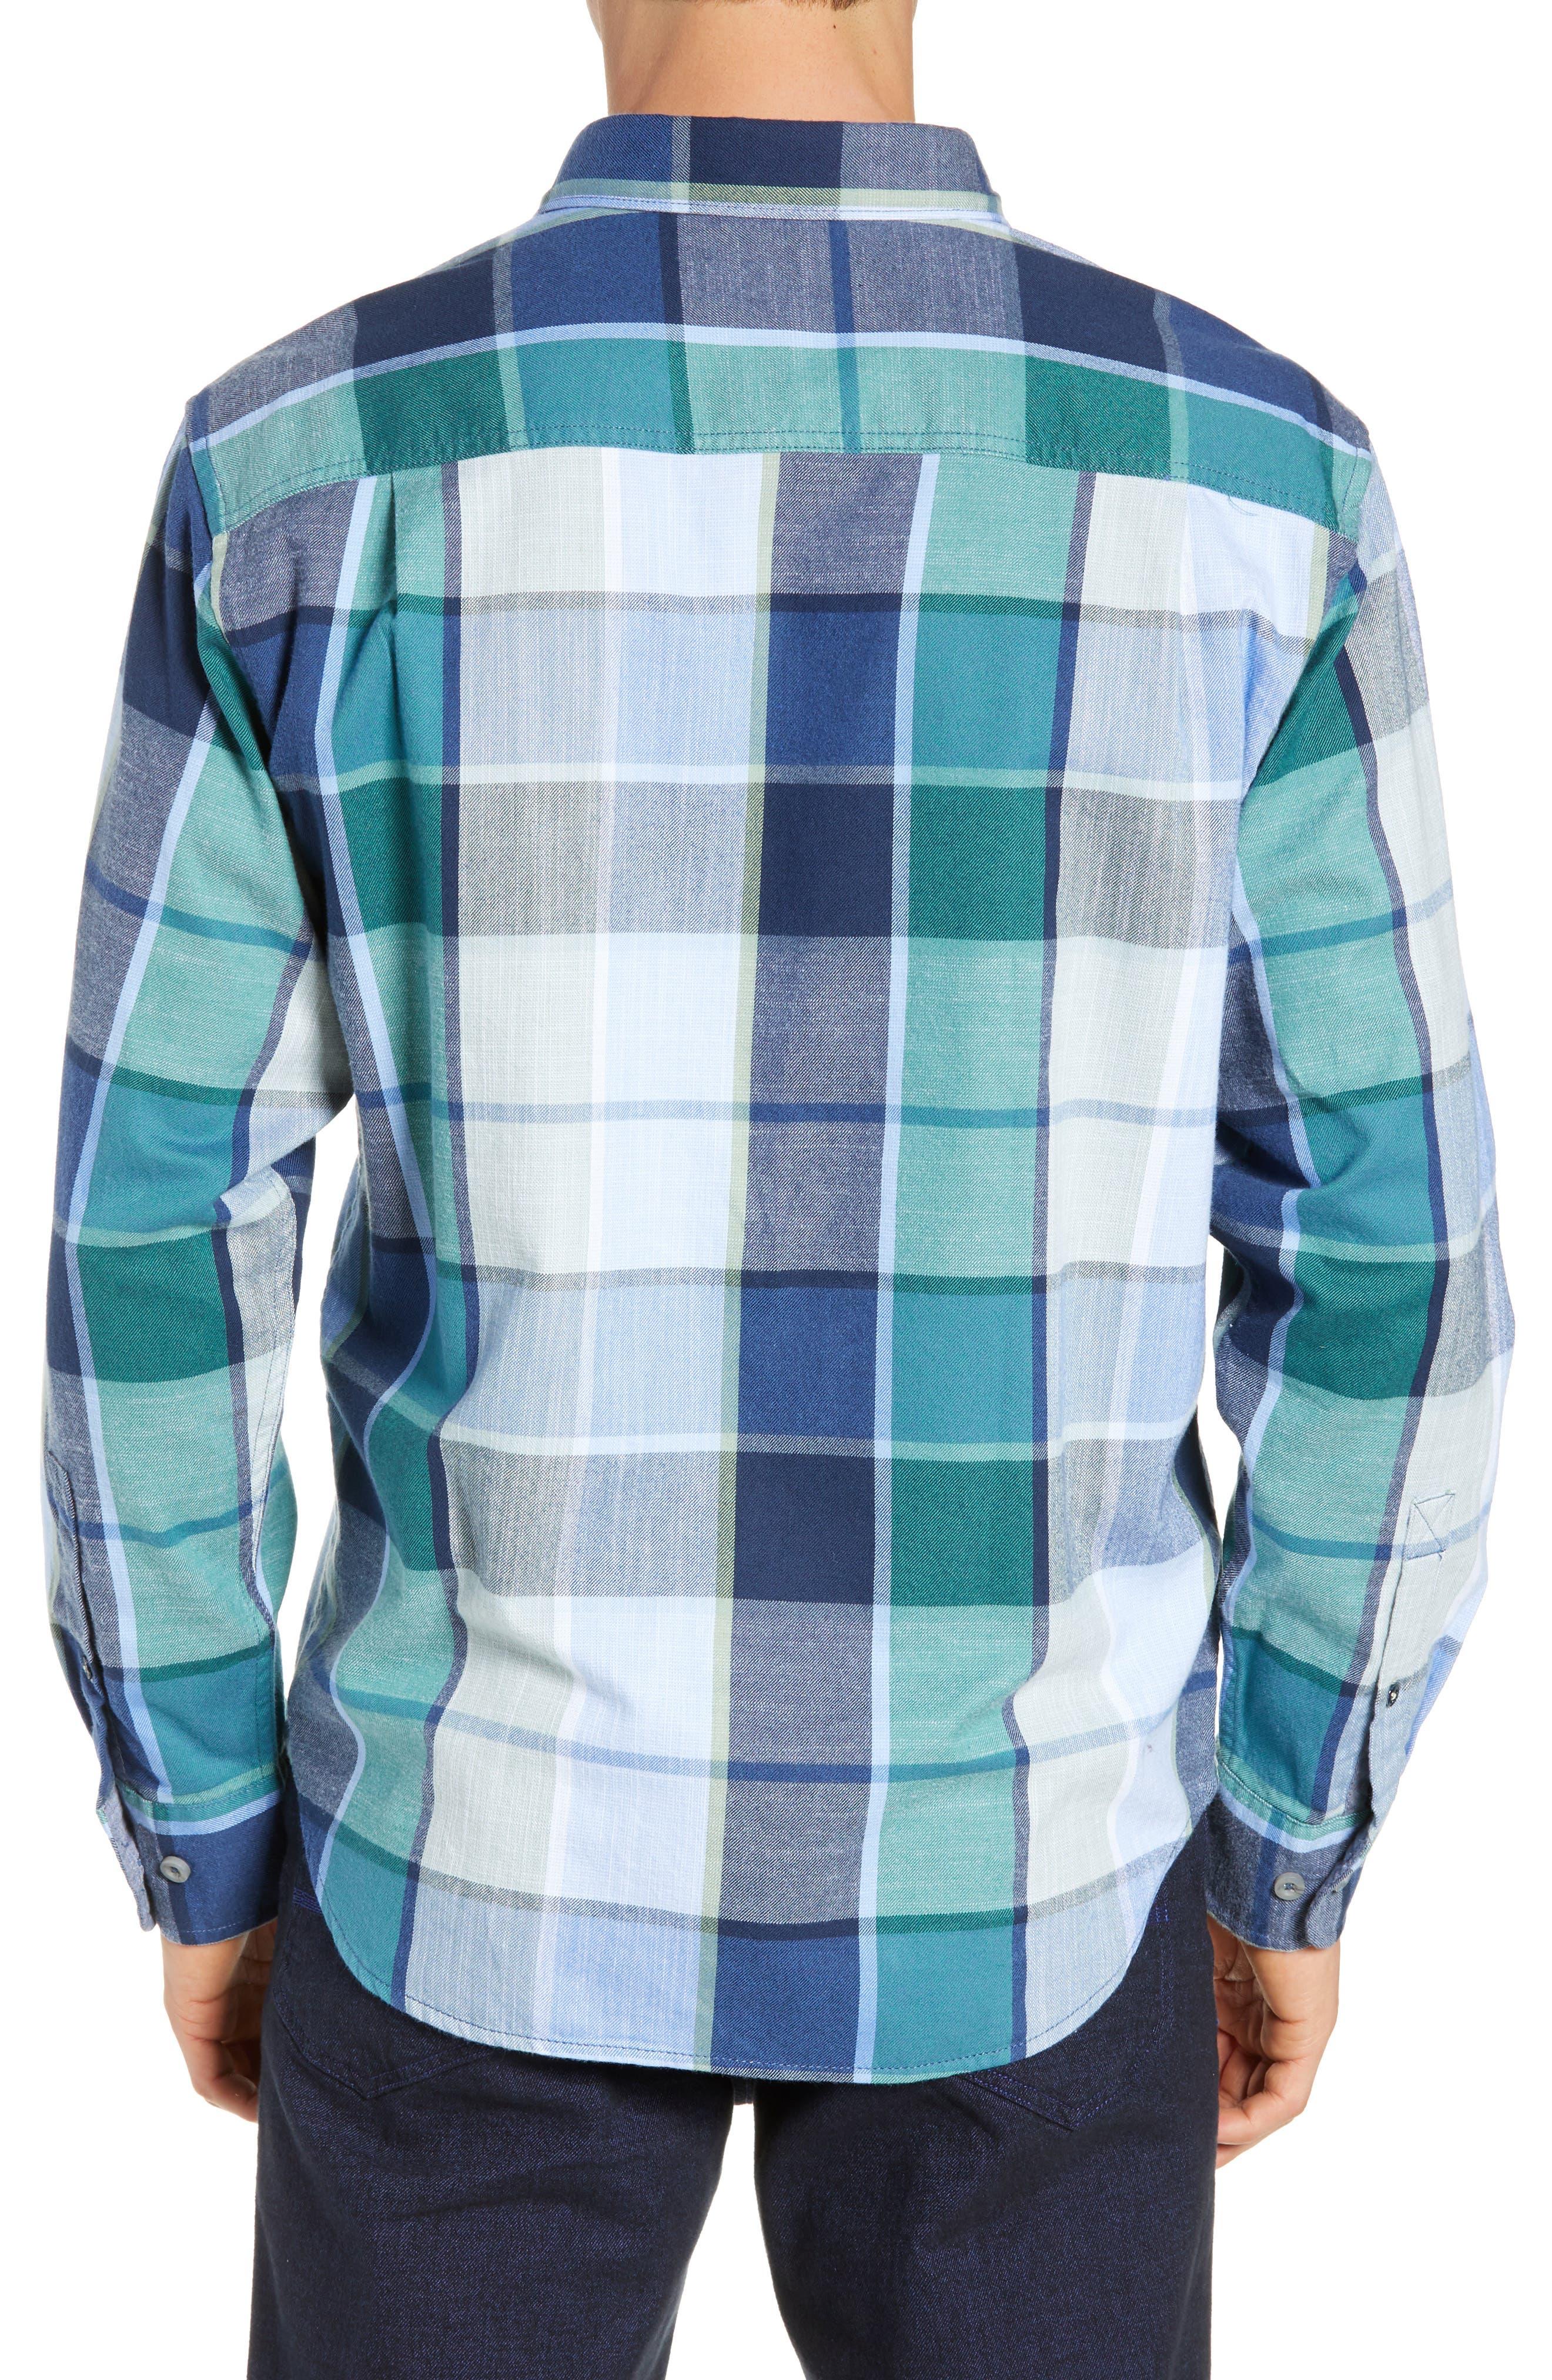 Heredia Plaid Sport Shirt,                             Alternate thumbnail 3, color,                             ZEPHYR BLUE